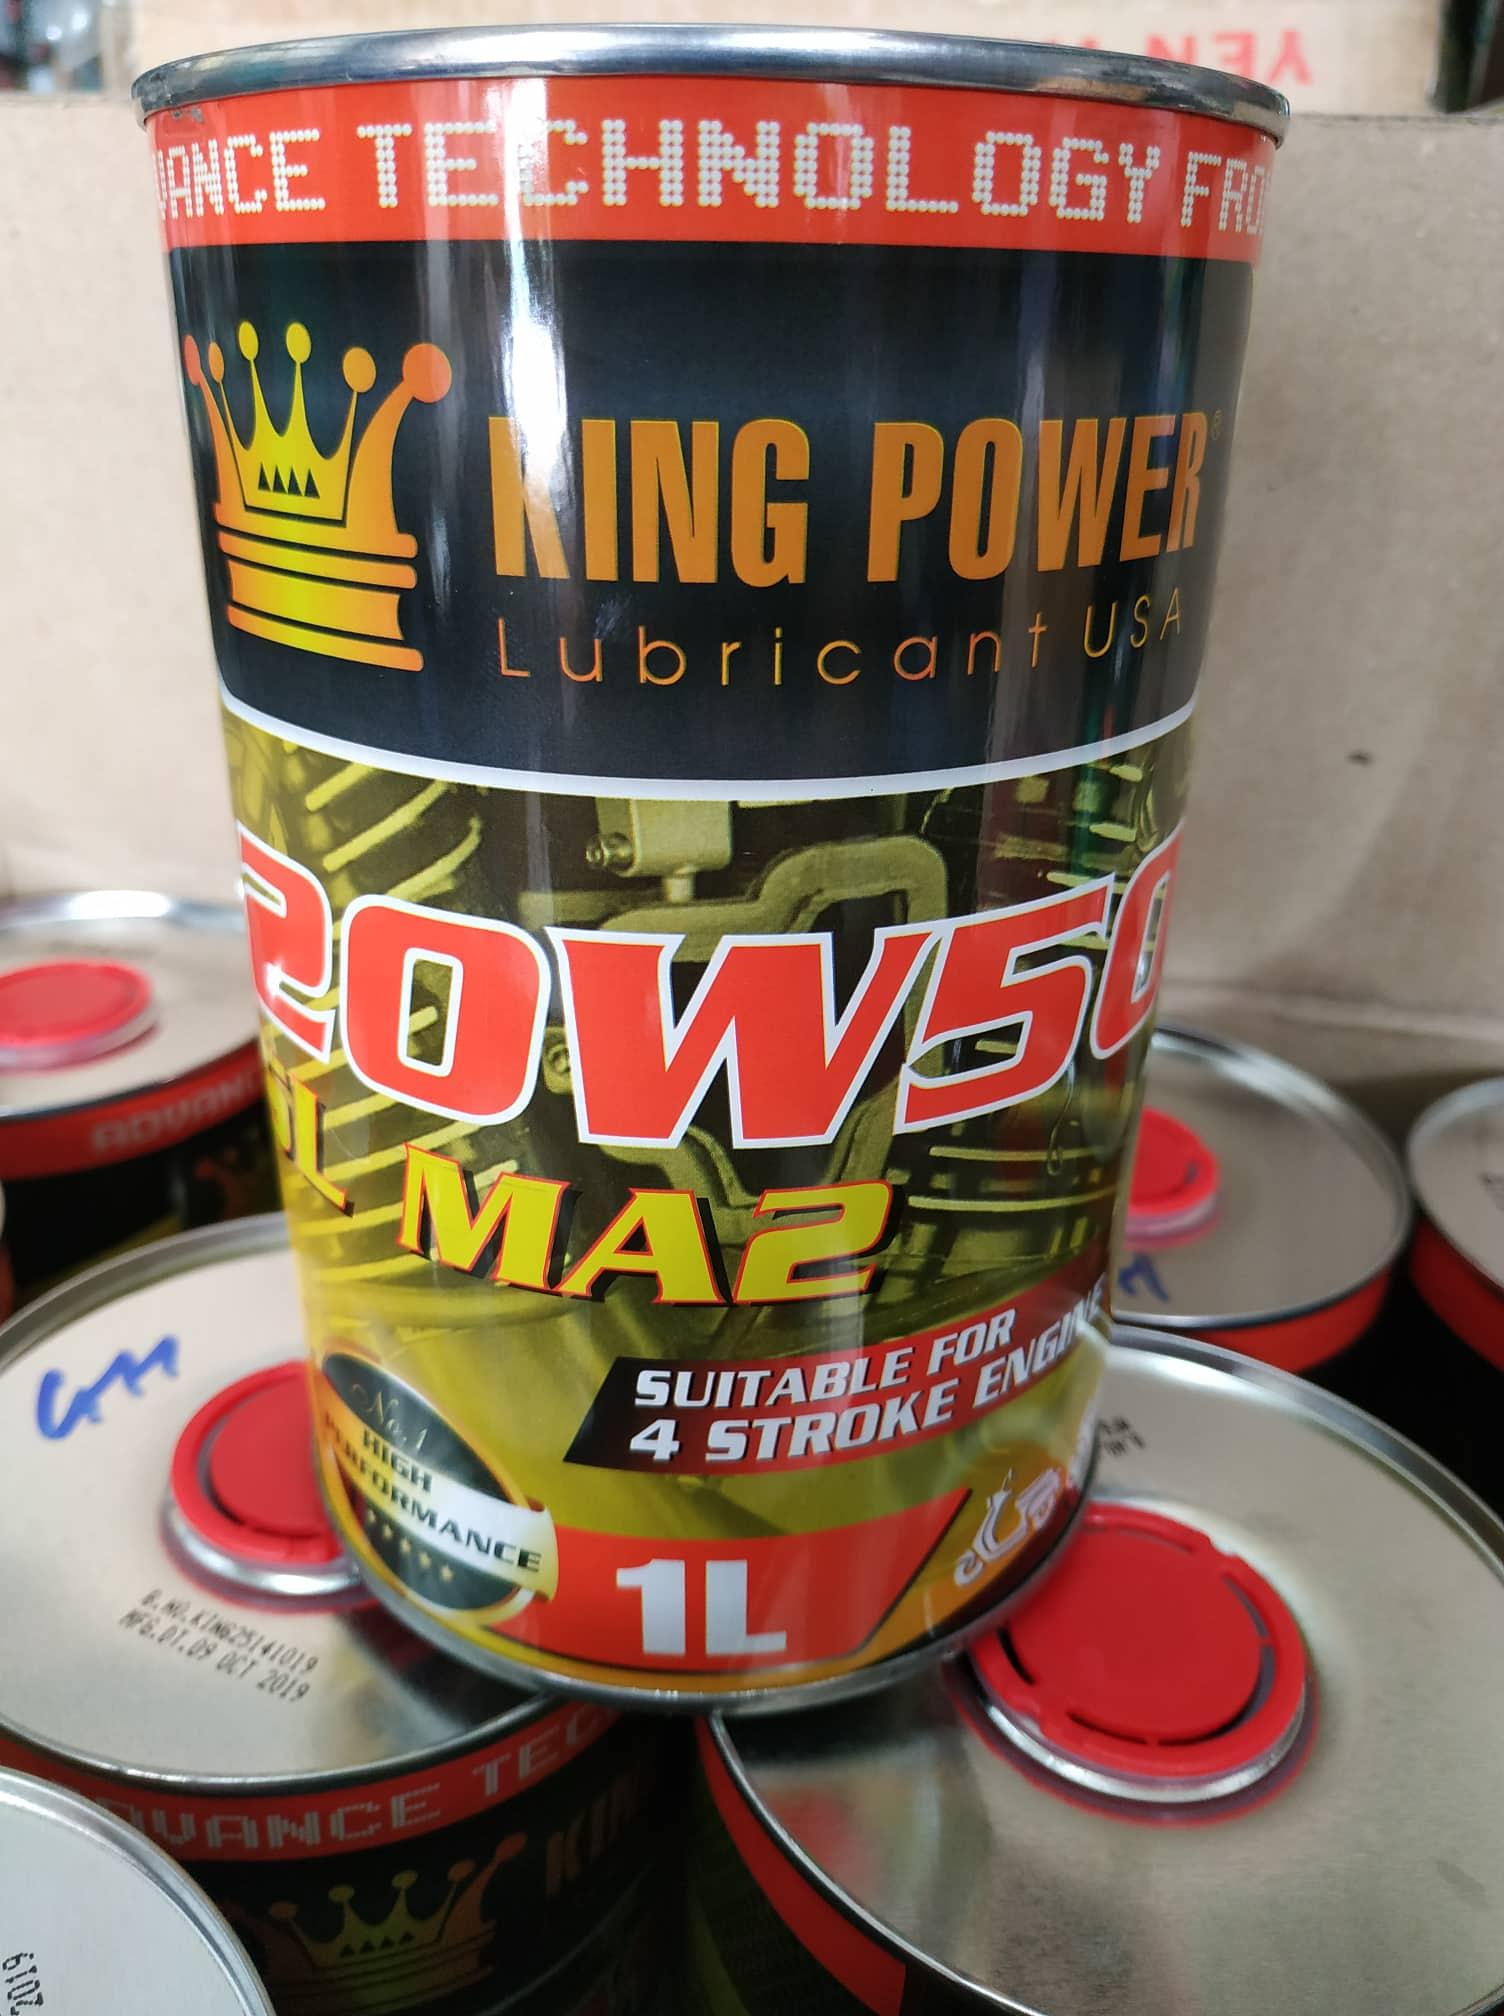 Voucher tại Lazada cho NHỚT LON MỸ KING POWER 20W50